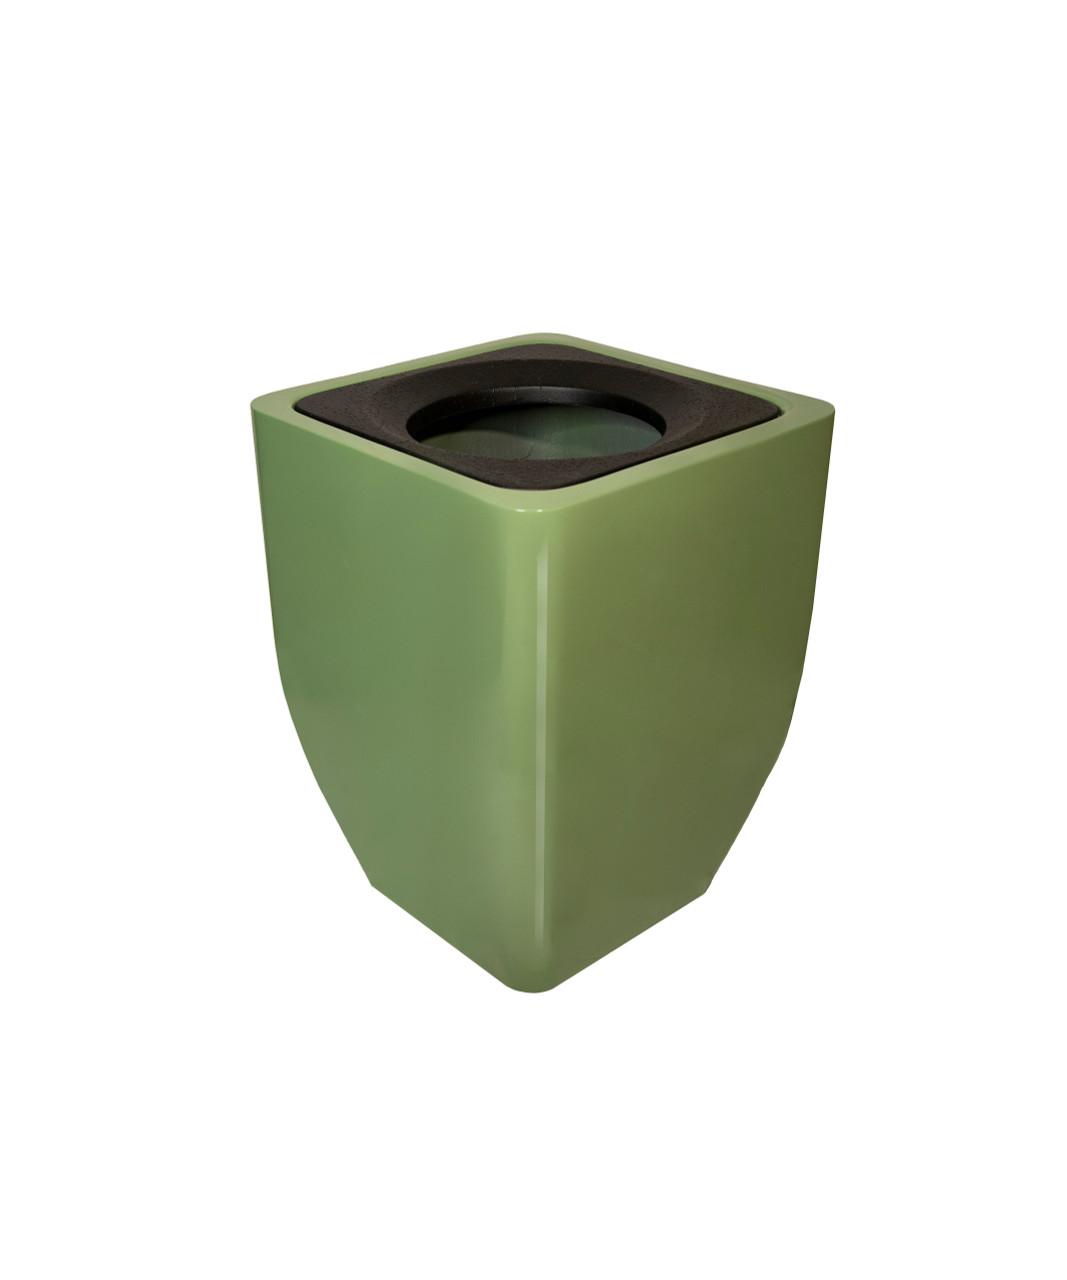 32 Gallon Fiberglass OXFORD Decorative Trash Receptacle